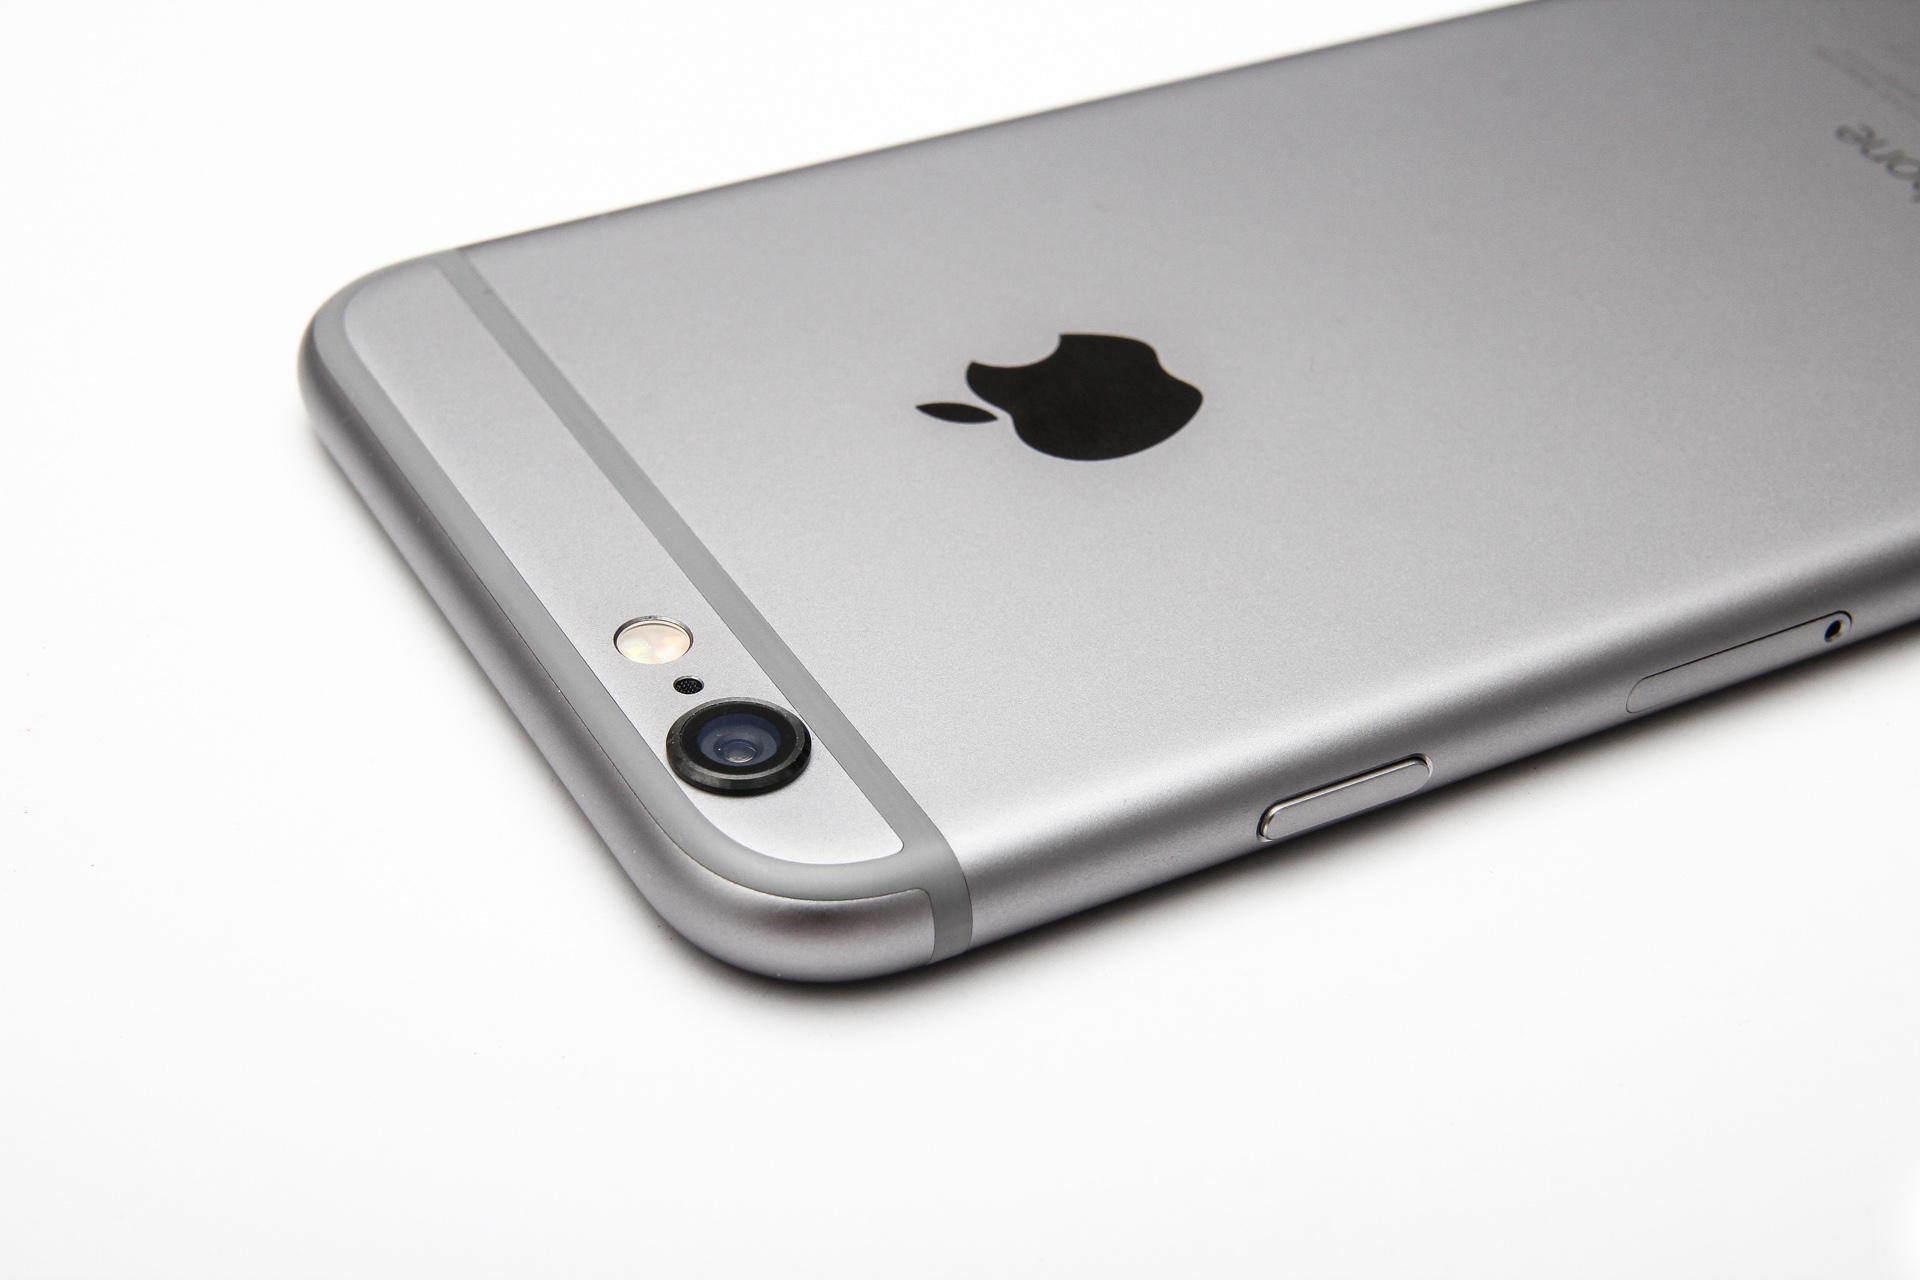 iphone-6-reklam.jpg